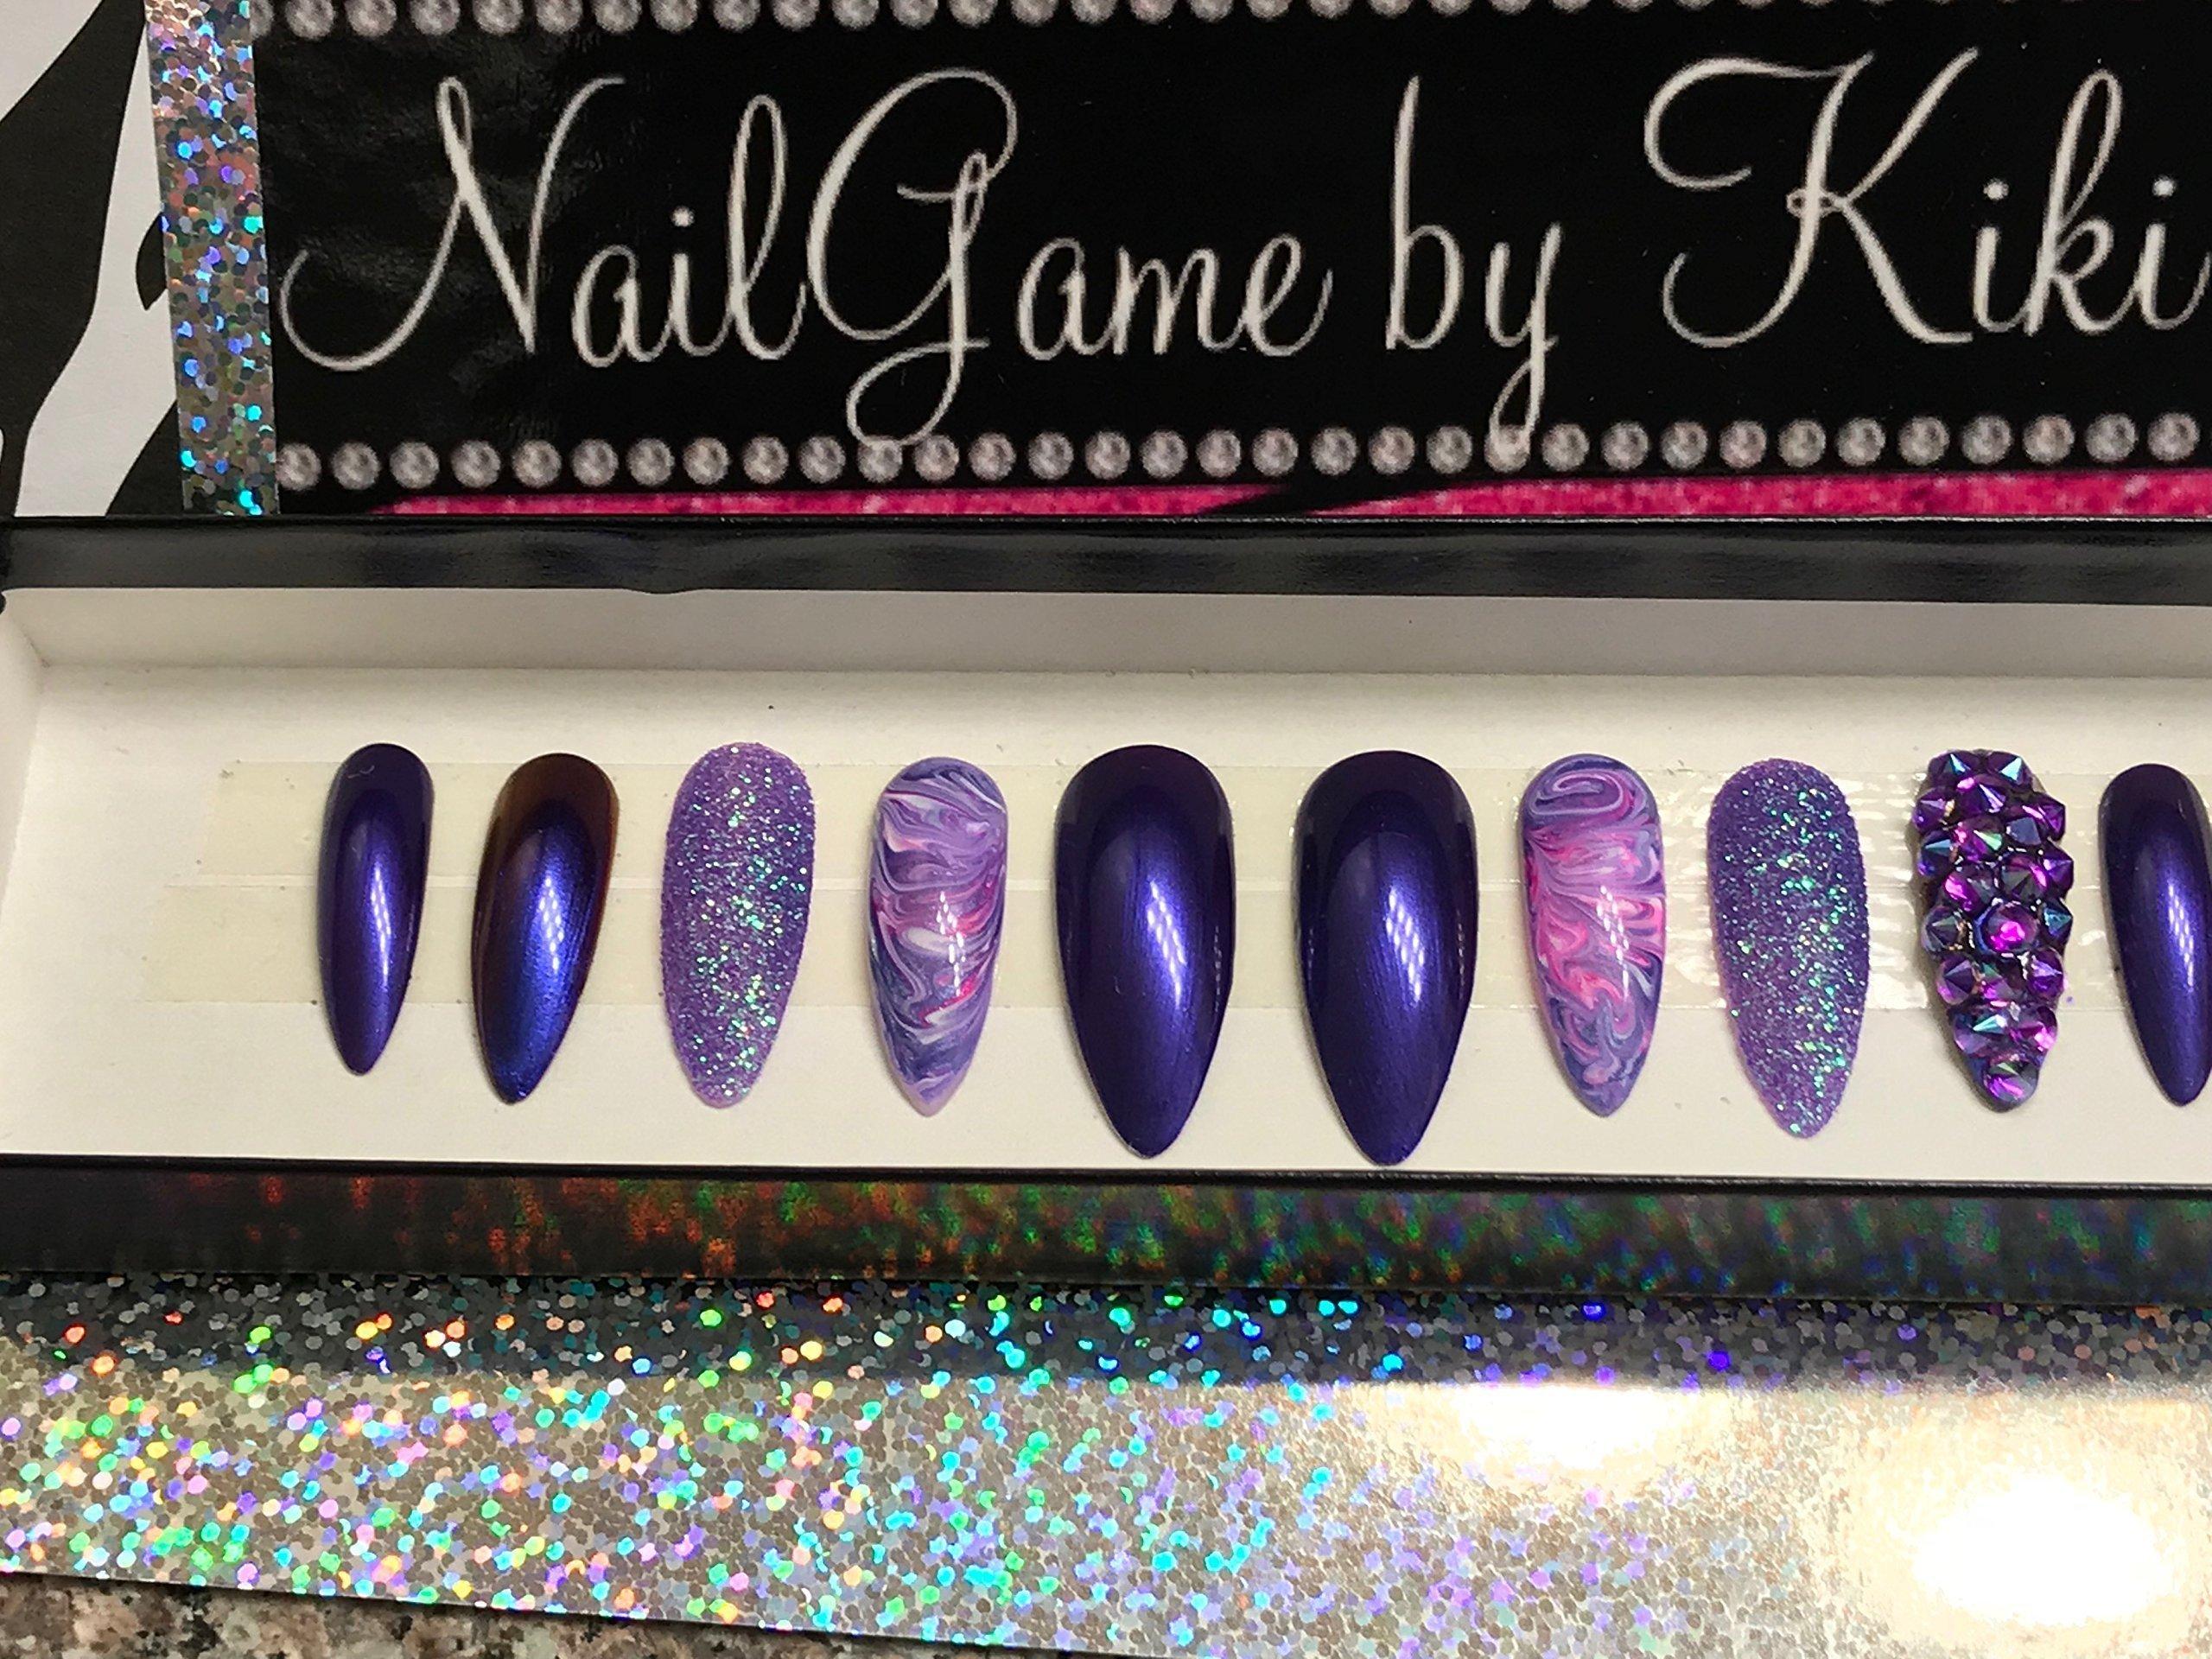 Dem Purples with a swirl Hand Designed Press-on Glue-on Nails Custom Nails False Nails Fake Nails Coffin Nails Handmade Nail Set